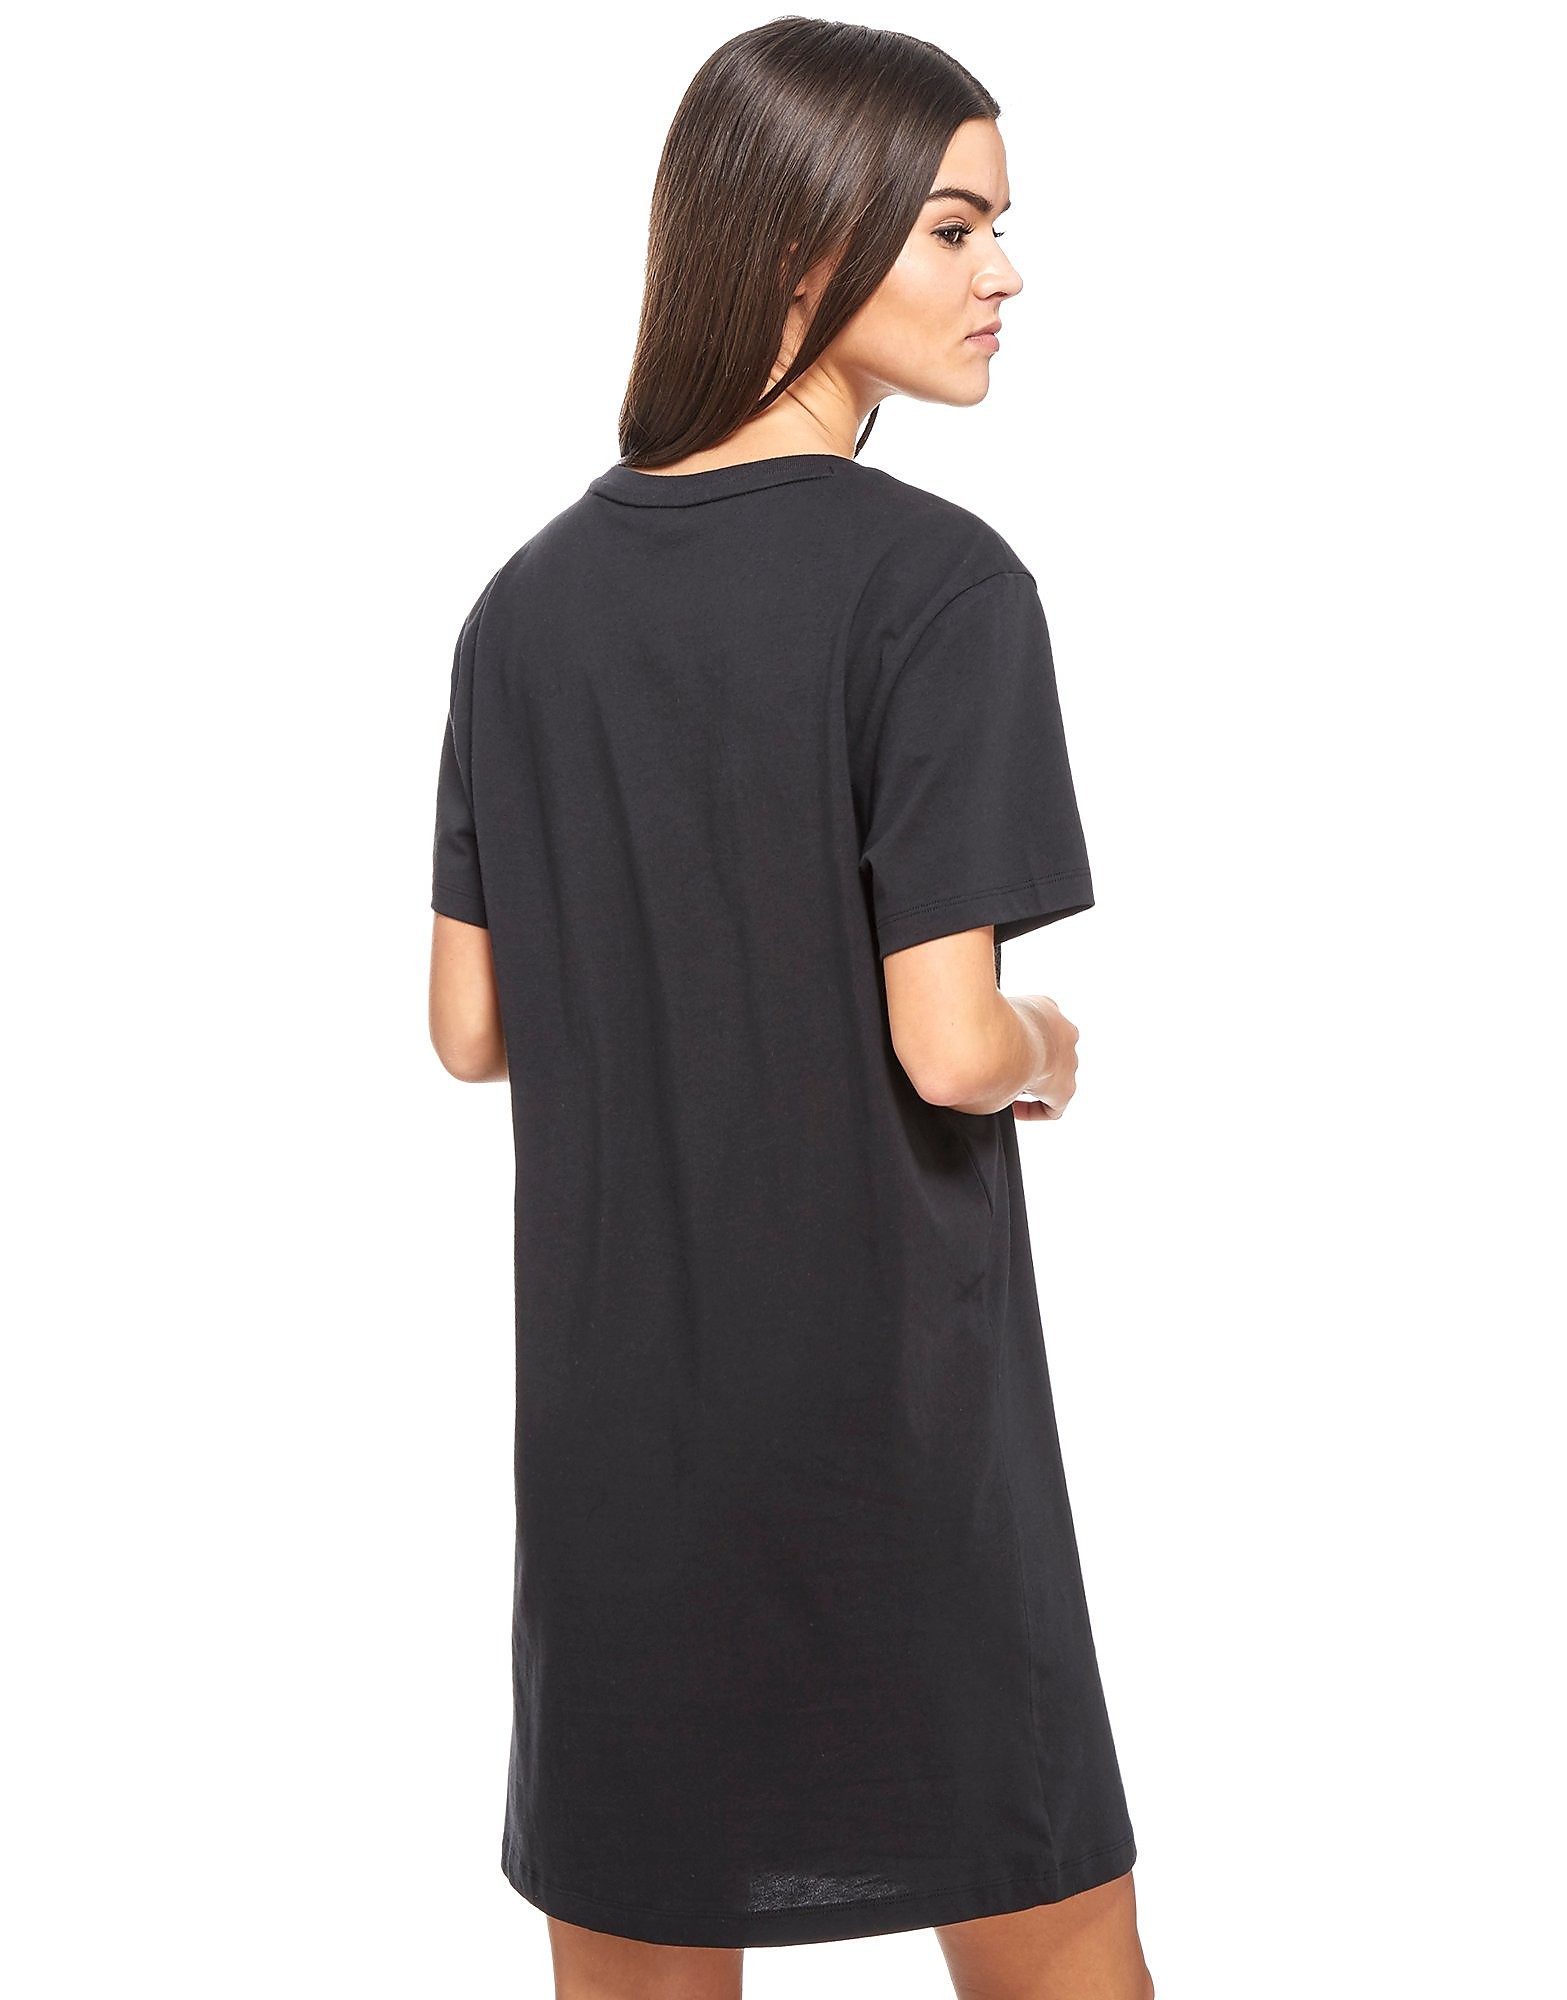 adidas Originals Trefoil T-Shirt Dress